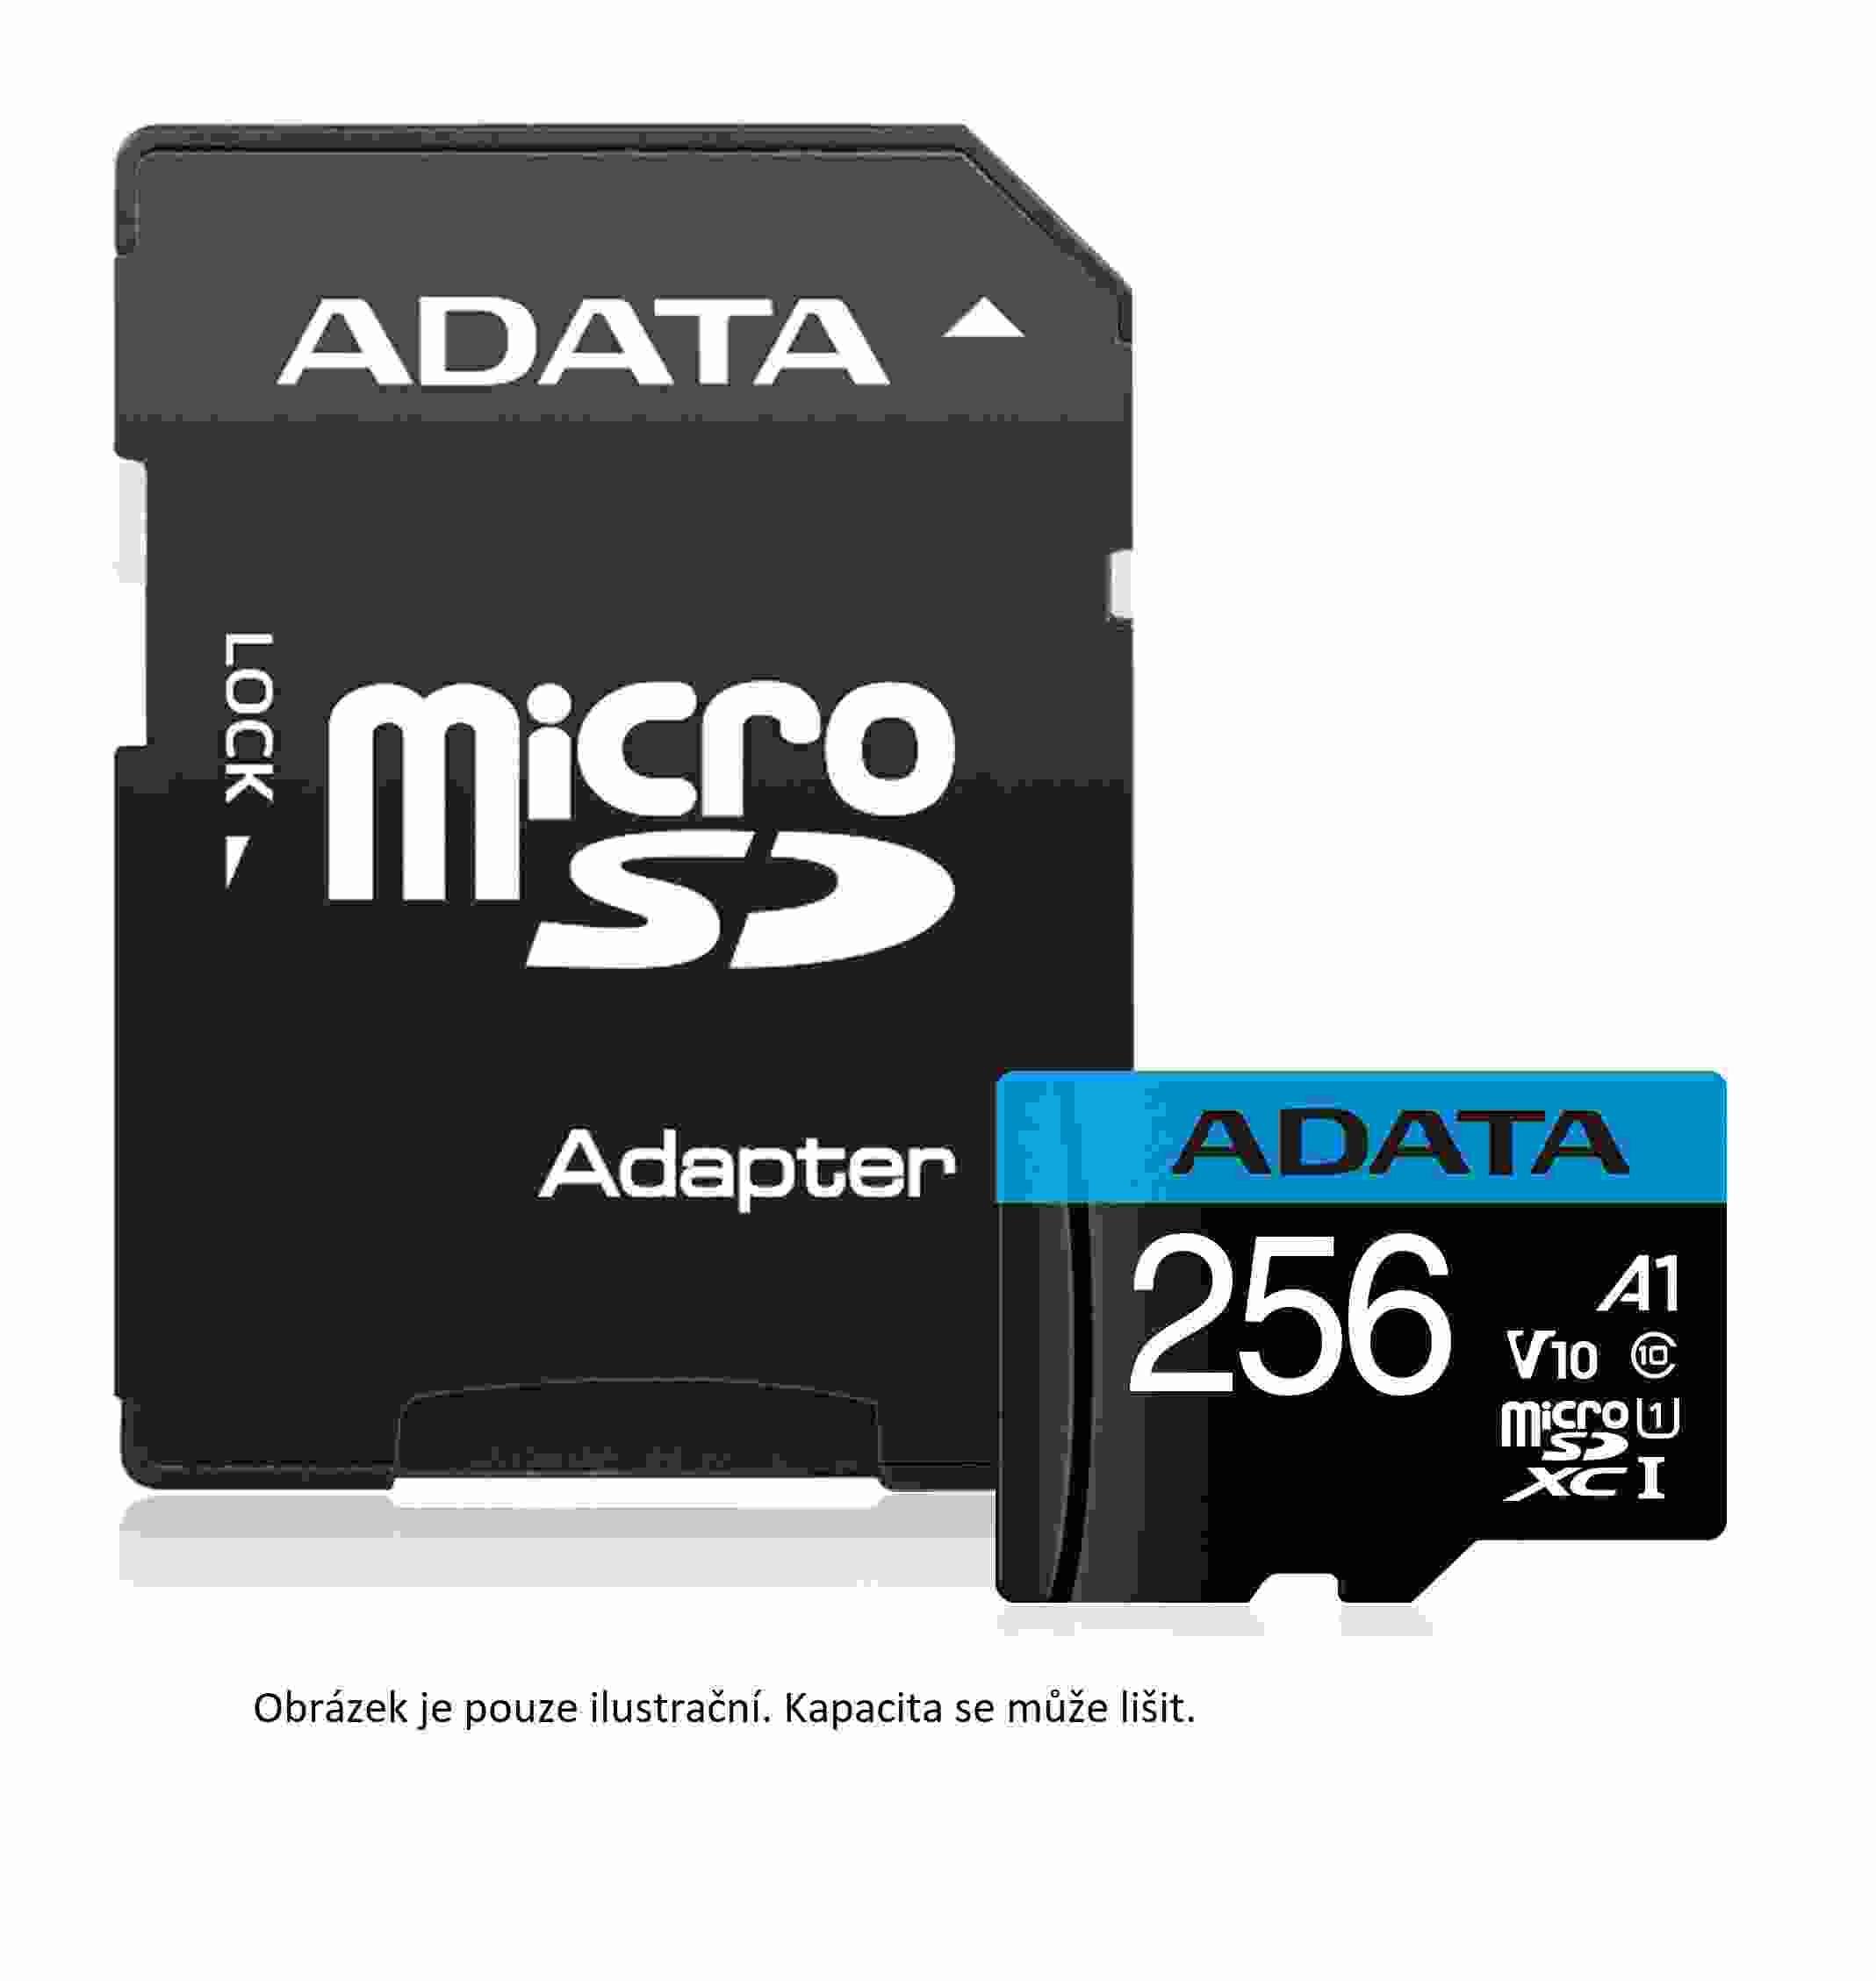 ADATA Micro SDHC karta 16GB UHS-I Class 10, Premier + ADAPTER